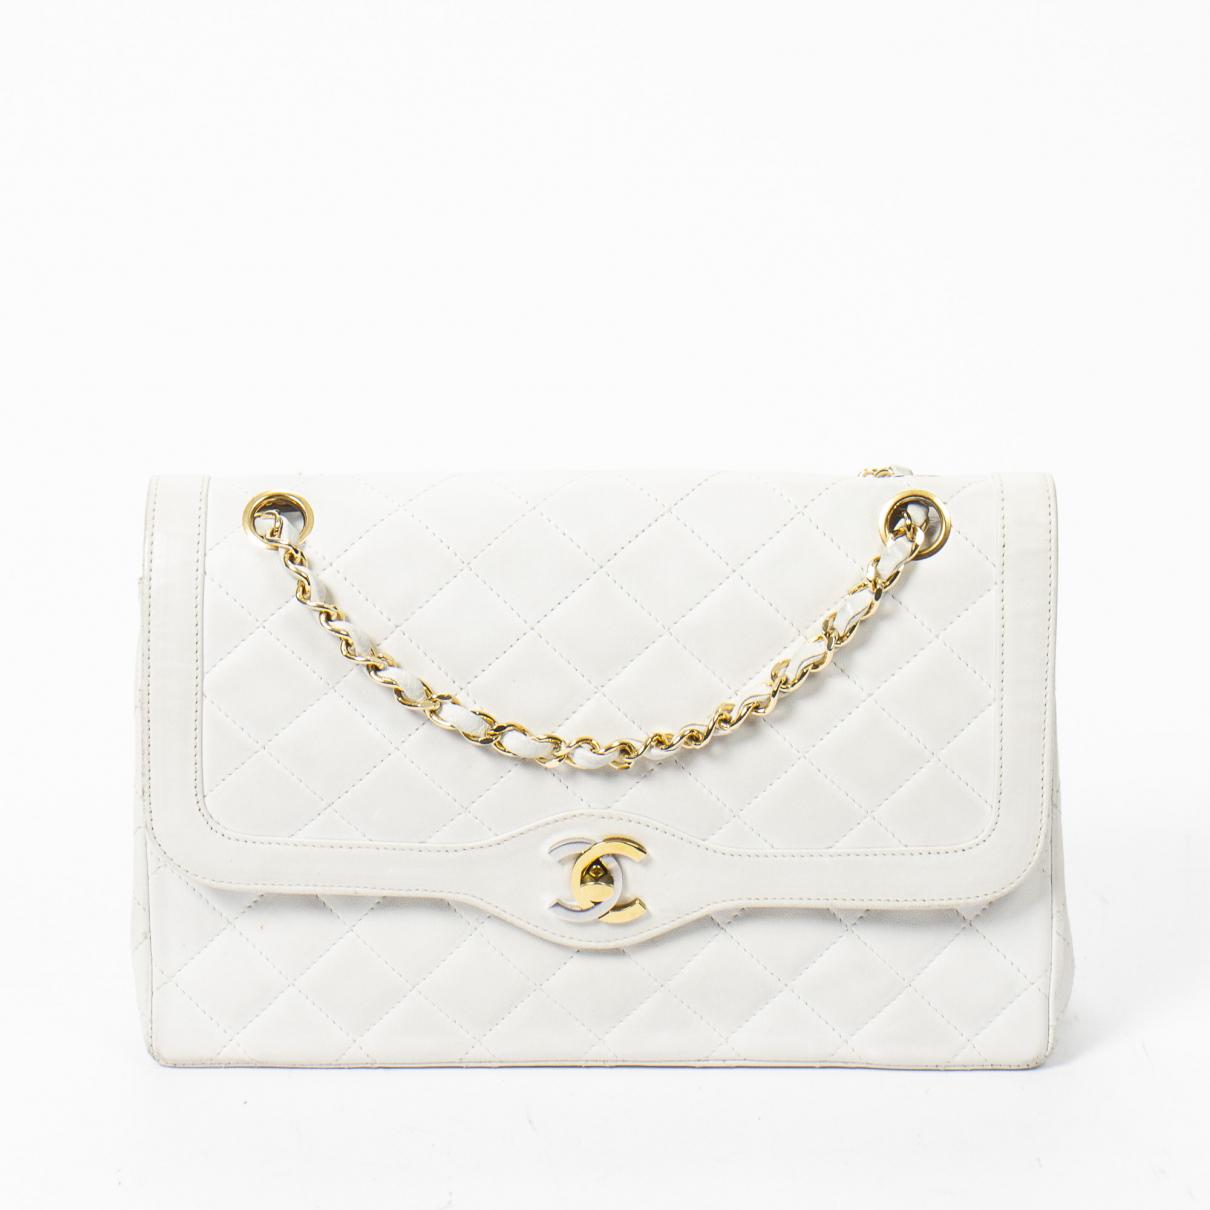 Chanel Timeless/Classique White Leather handbag for Women \N